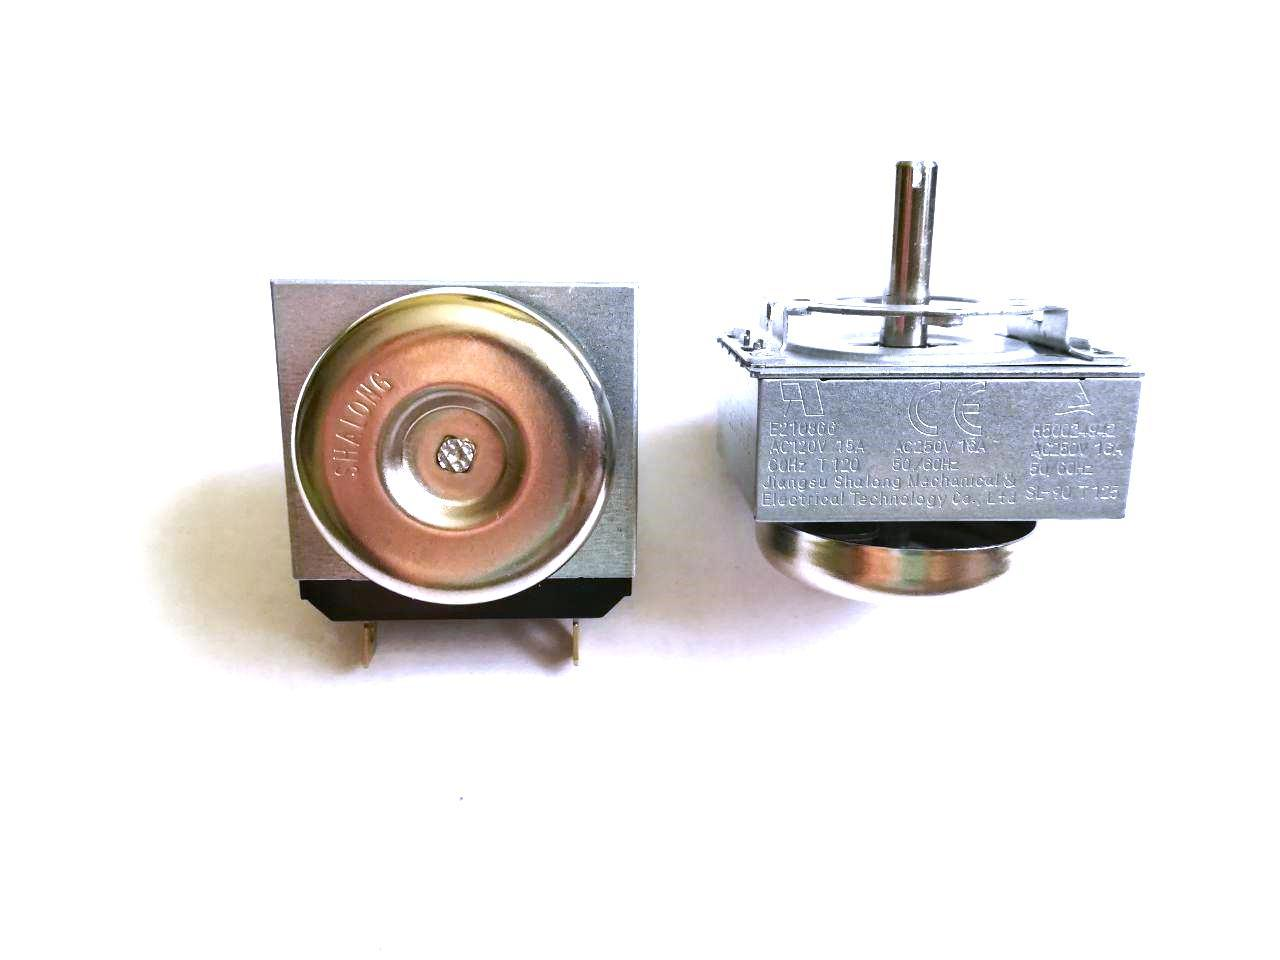 Таймер механический 16A / Tmax=90 / 250V Турция